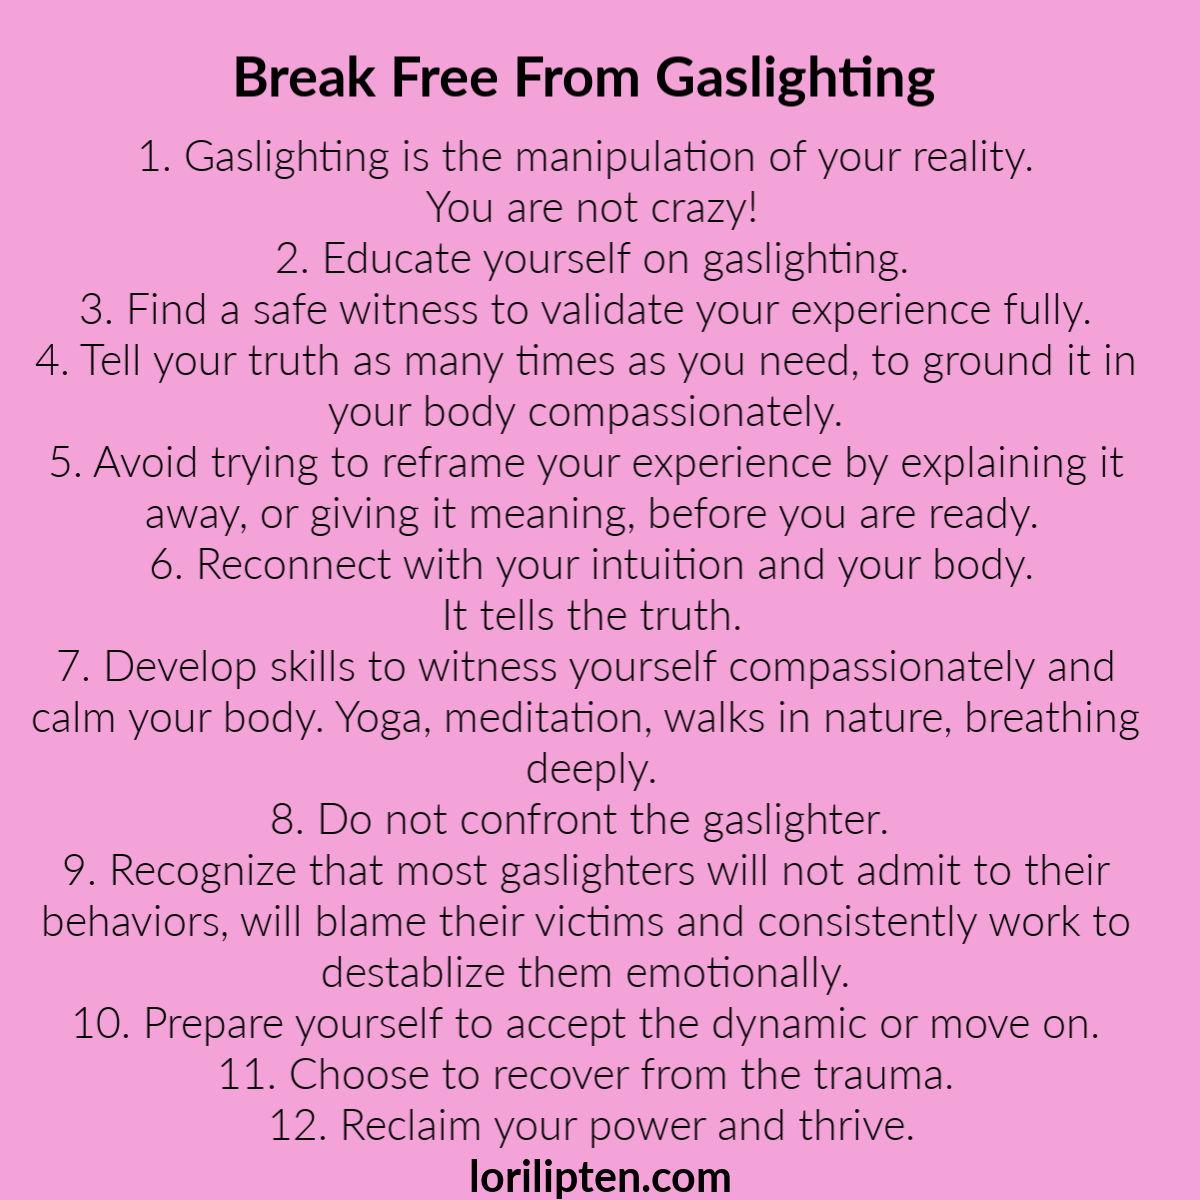 Breaking Free from Gaslighting